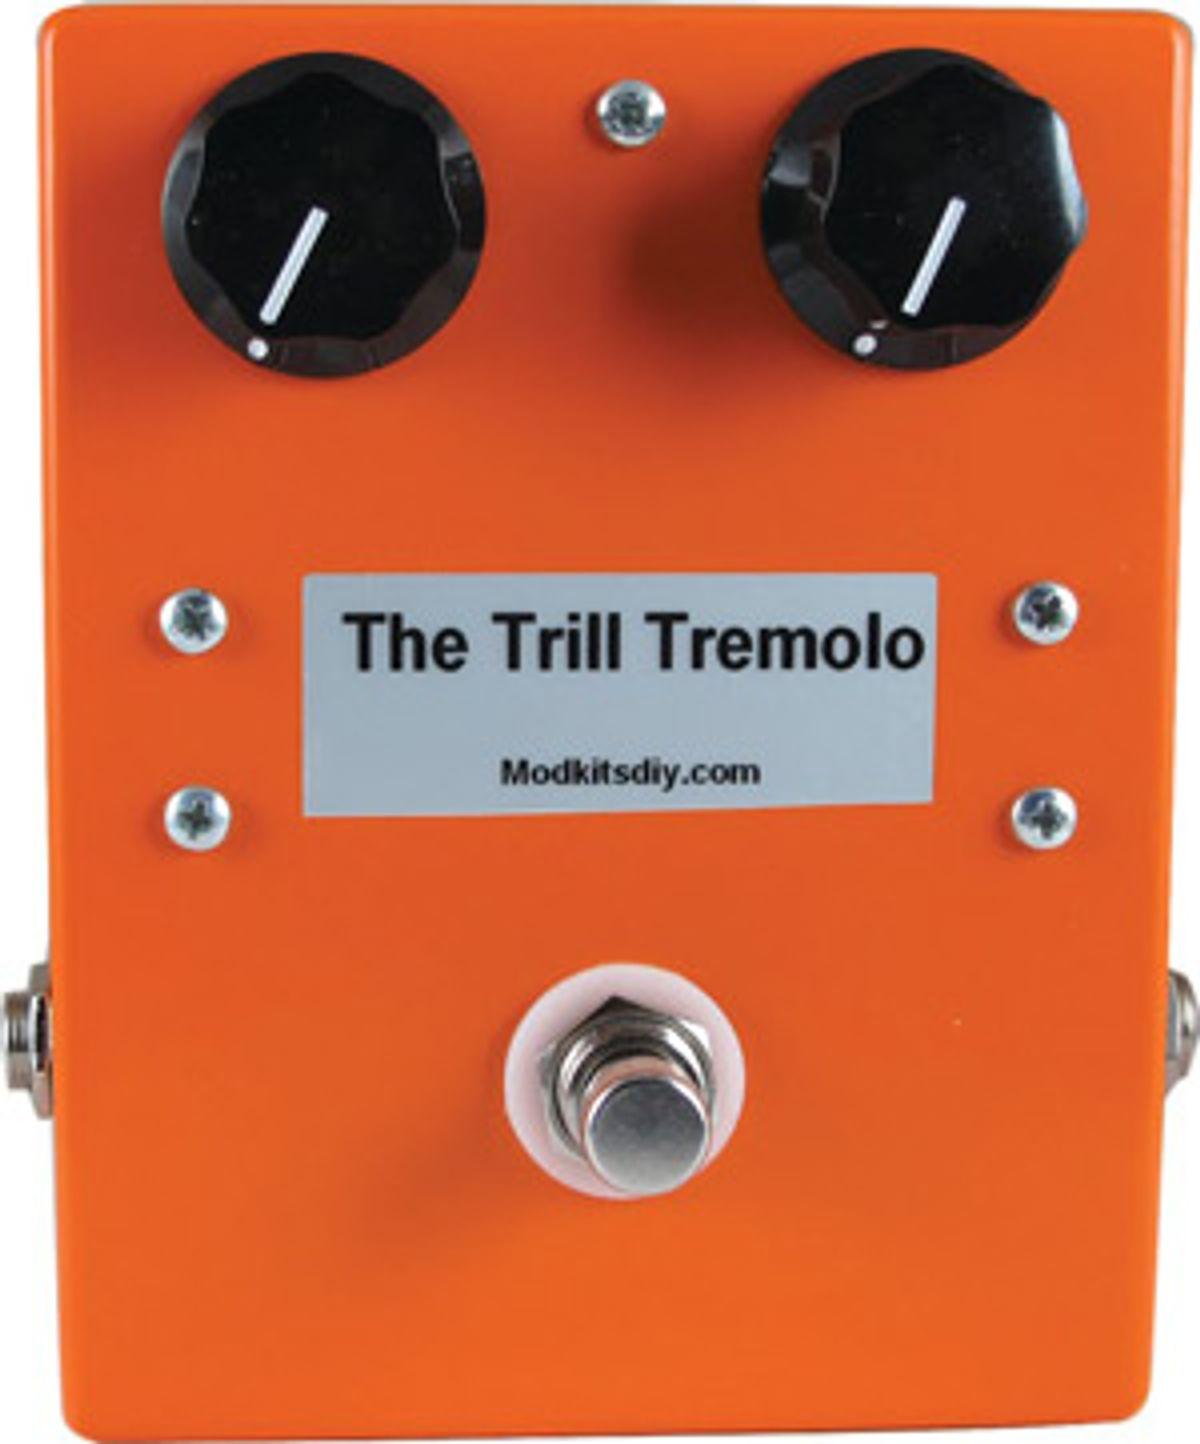 Mod Kits DIY Introduces Trill Tremolo Pedal Kit